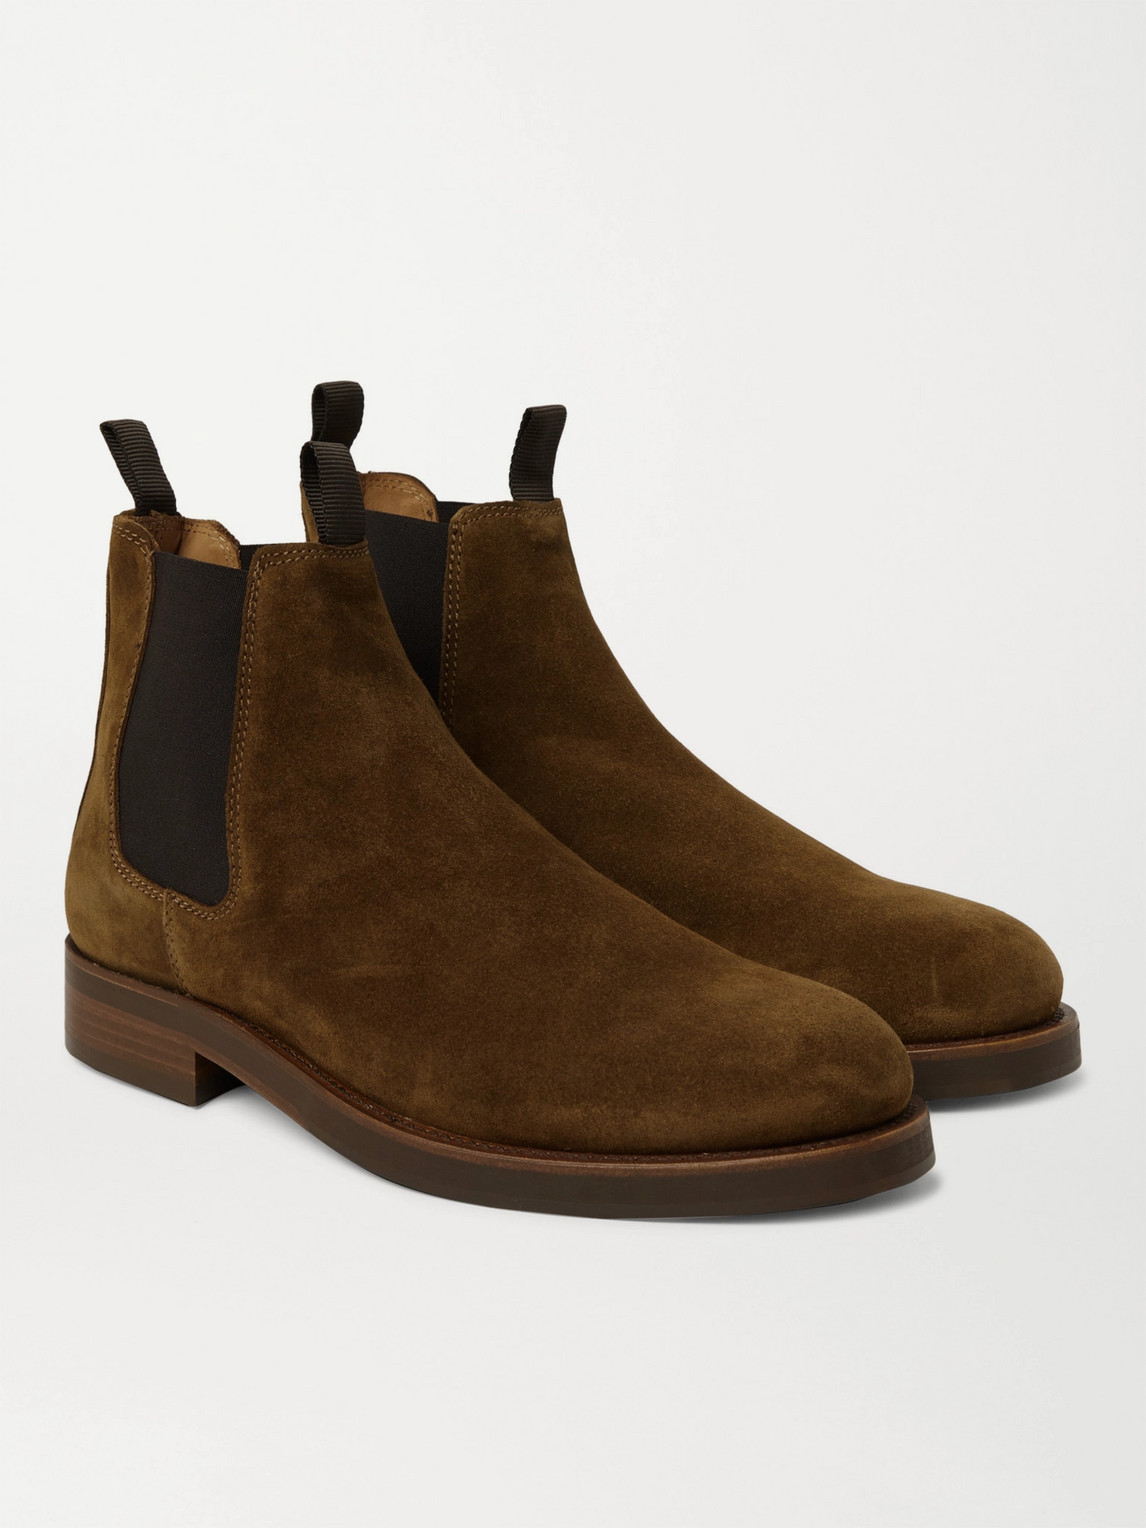 Belstaff Longton Suede Chelsea Boots In Tobacco